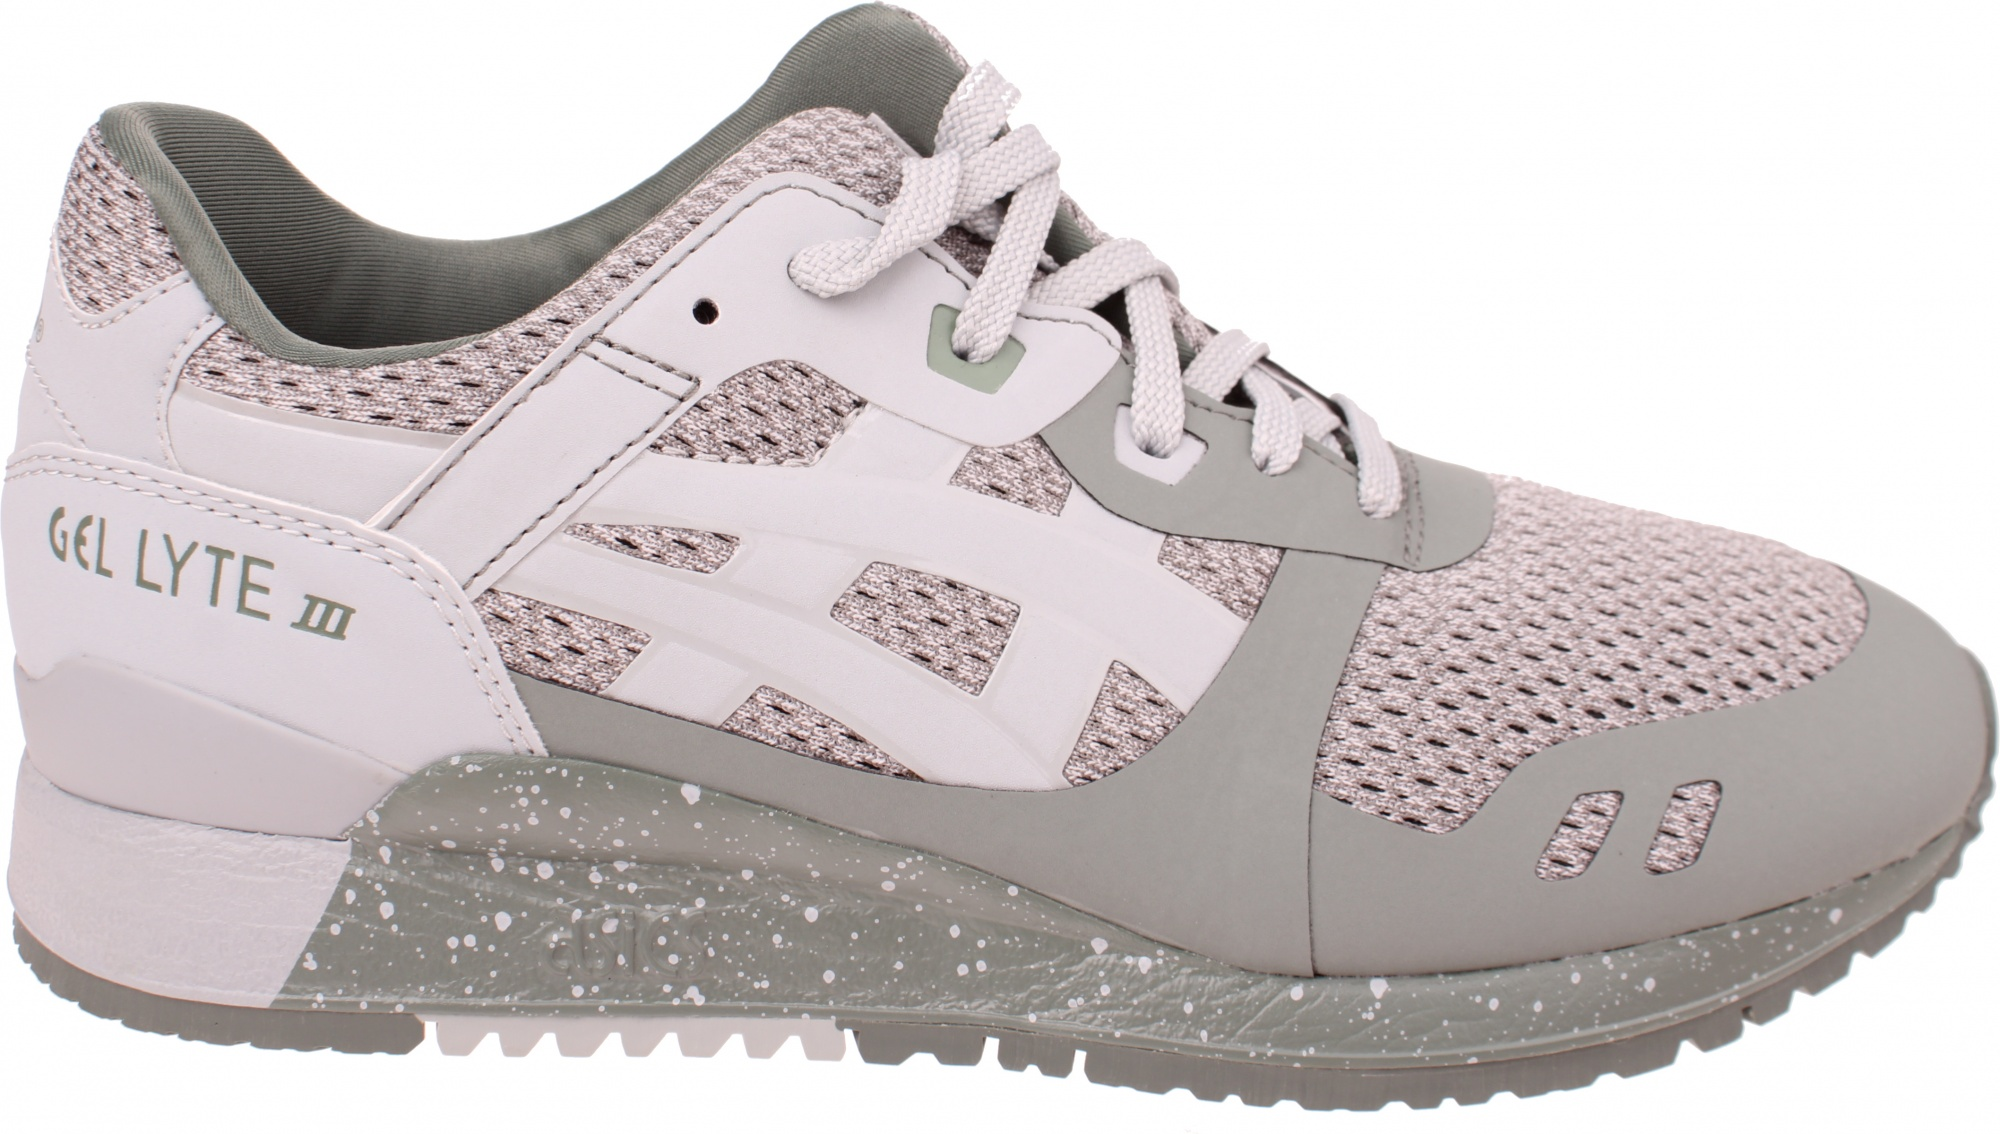 ASICS Sneakers Gel-Lyte III NS Männer grau / grün - Internet ...